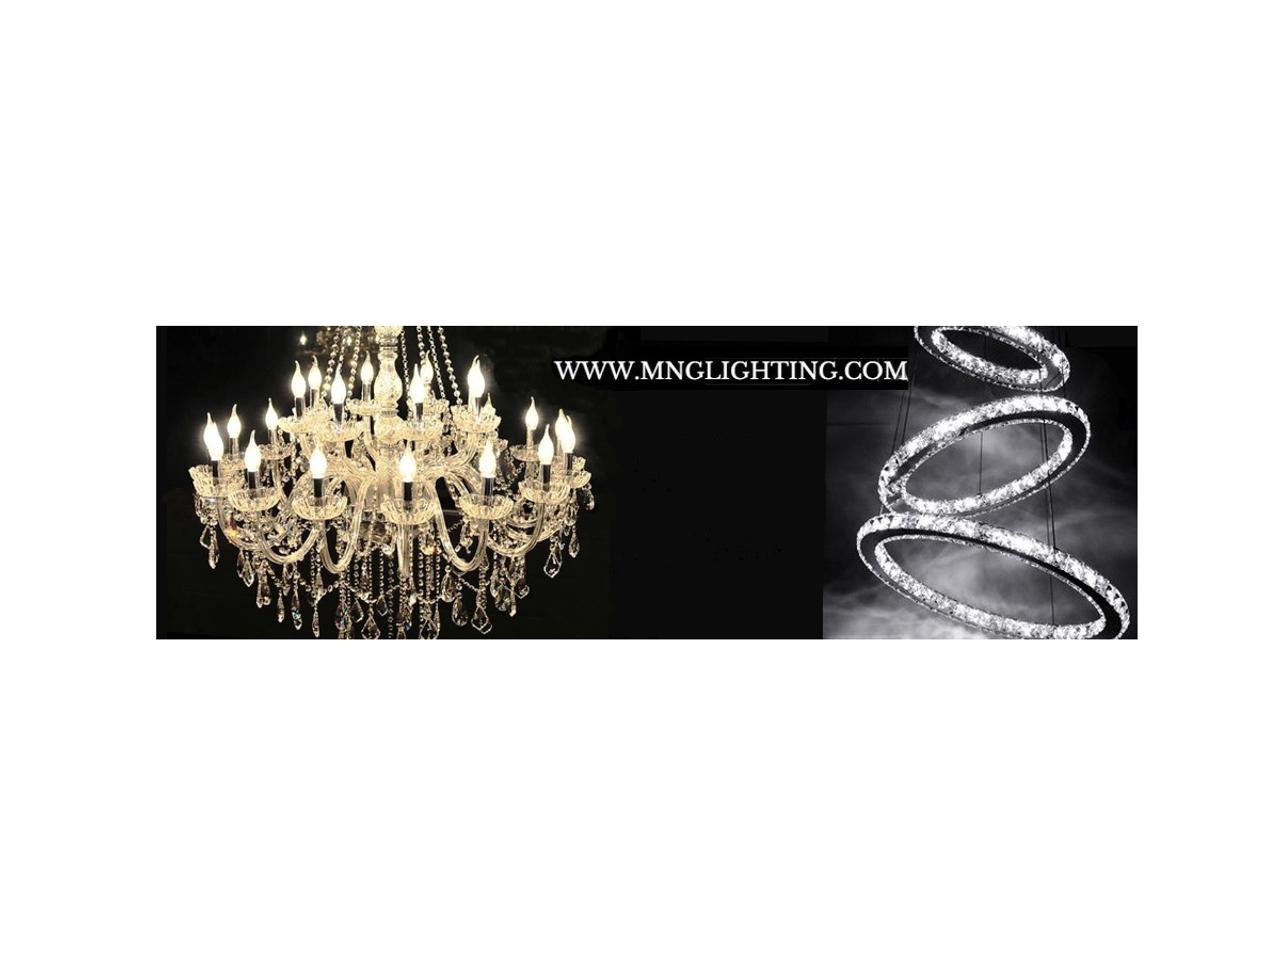 MNGLighting.com - Montreal Canada online Lighting store ...